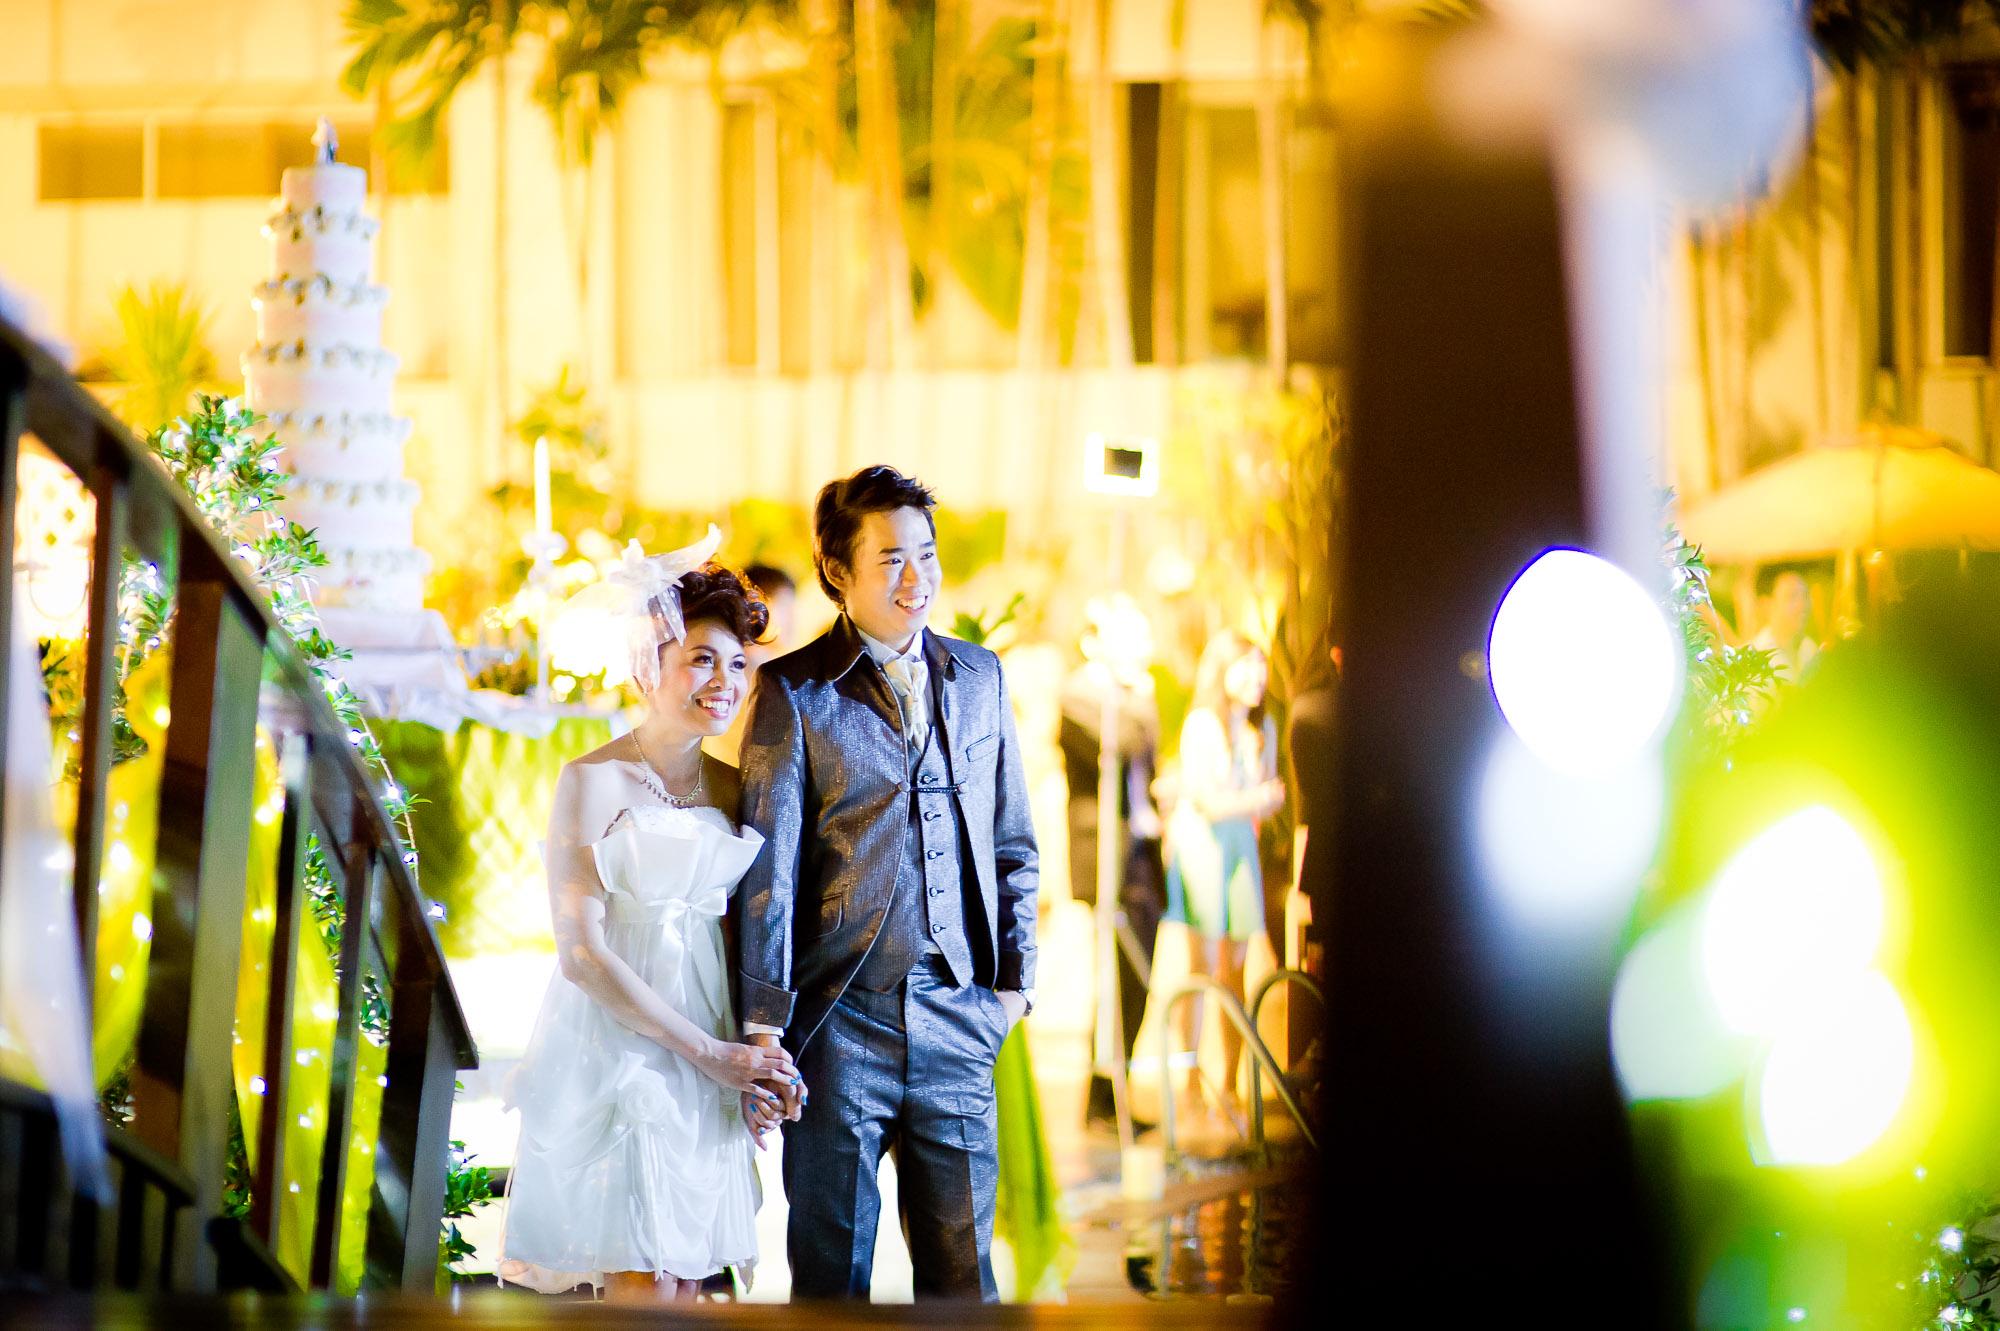 Thailand Wedding Photographer - Wedding - SC Park Hotel Bangkok Thailand